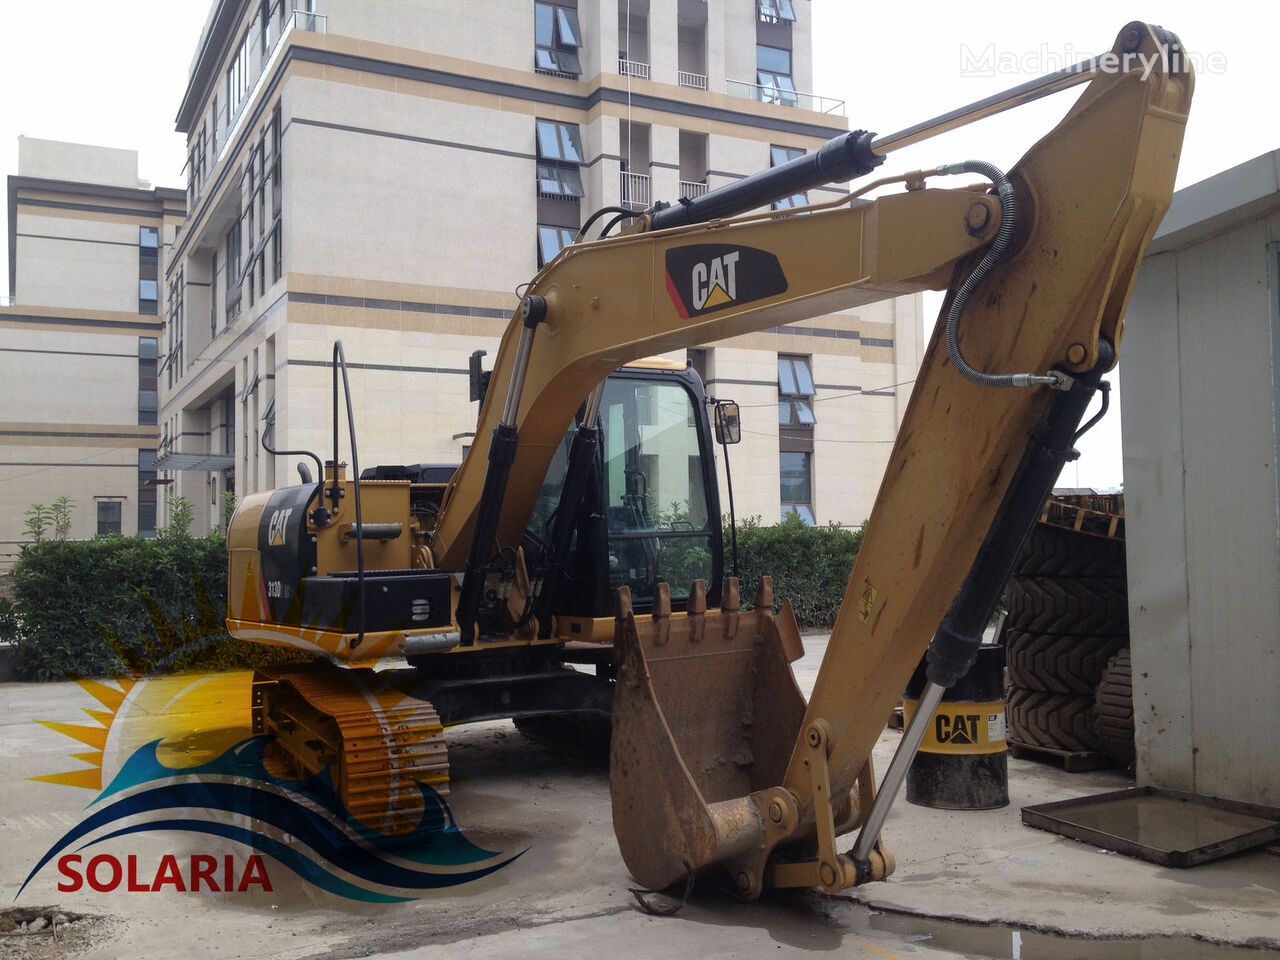 CATERPILLAR 313D2 GC tracked excavator